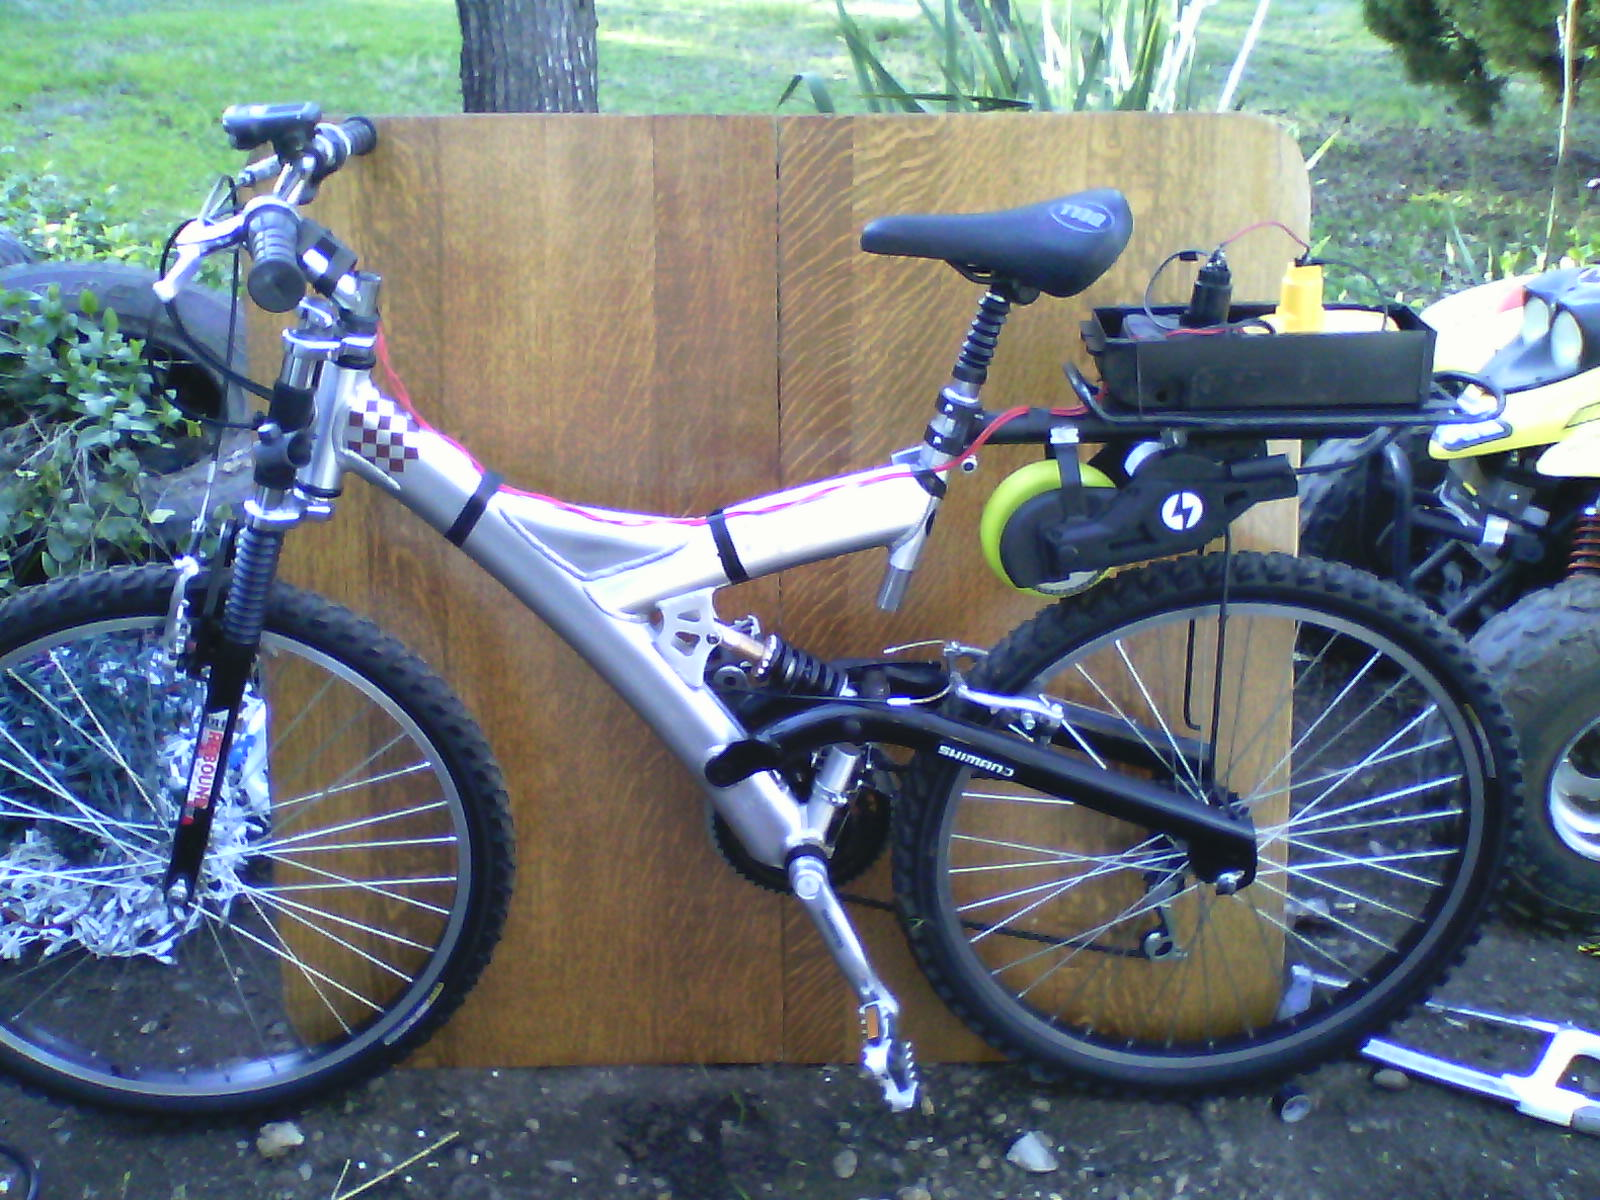 Electric motor bike (revised with better description)